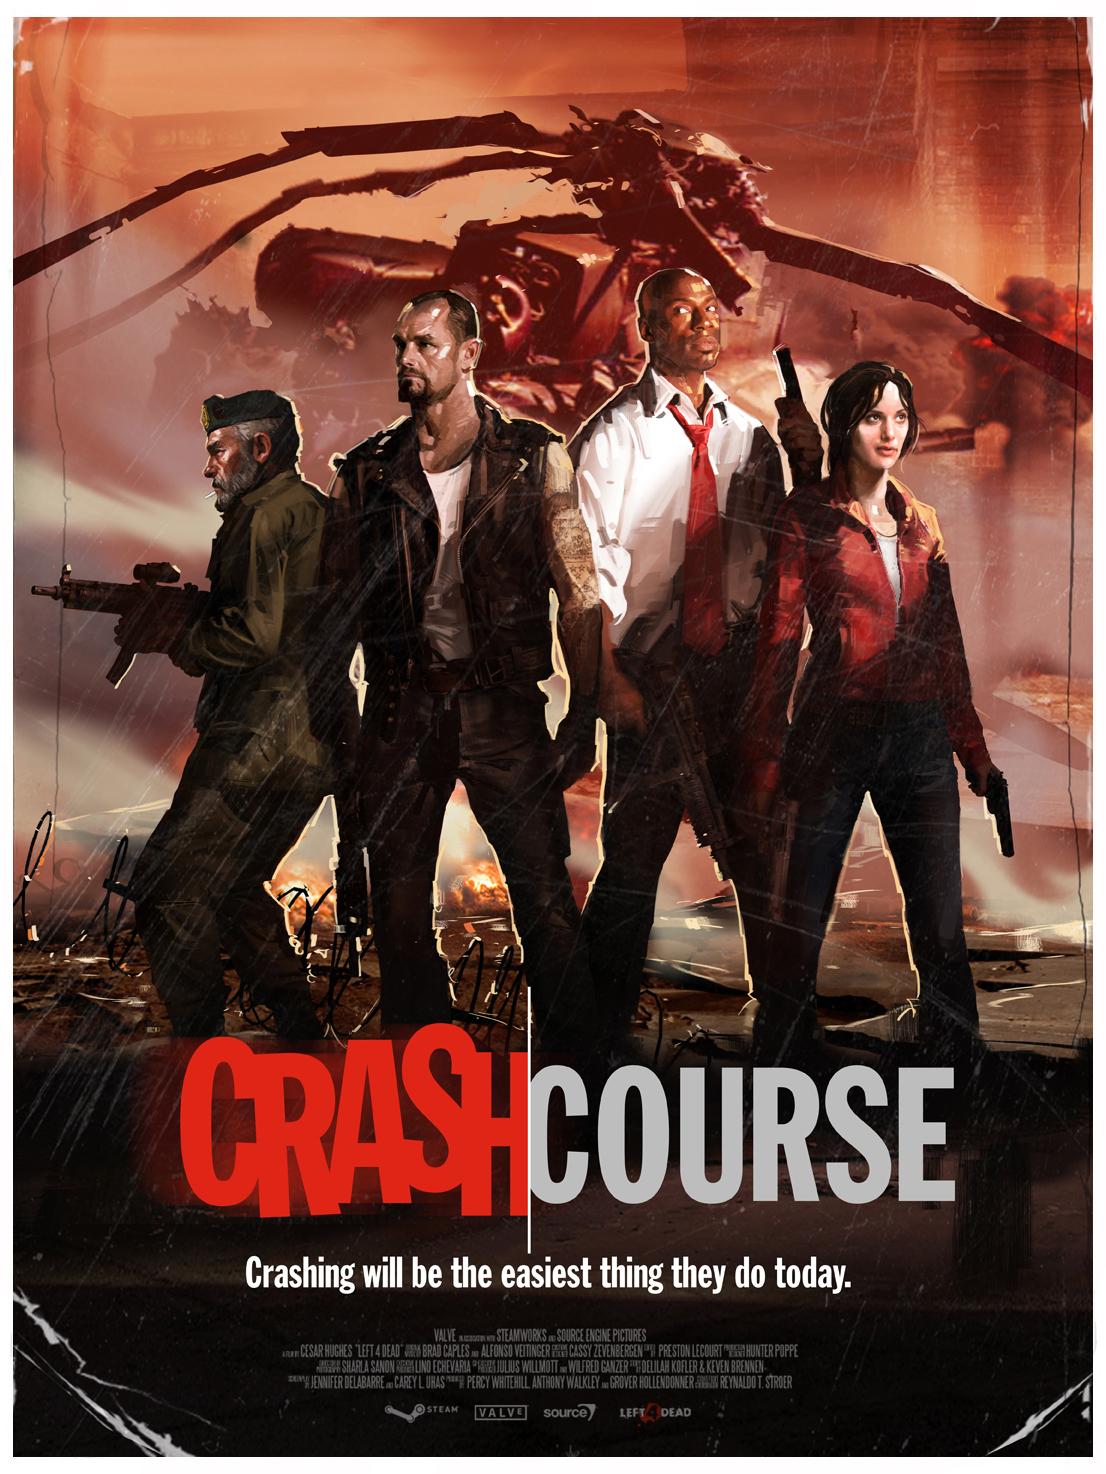 Crash Course | Left 4 Dead Wiki | FANDOM powered by Wikia